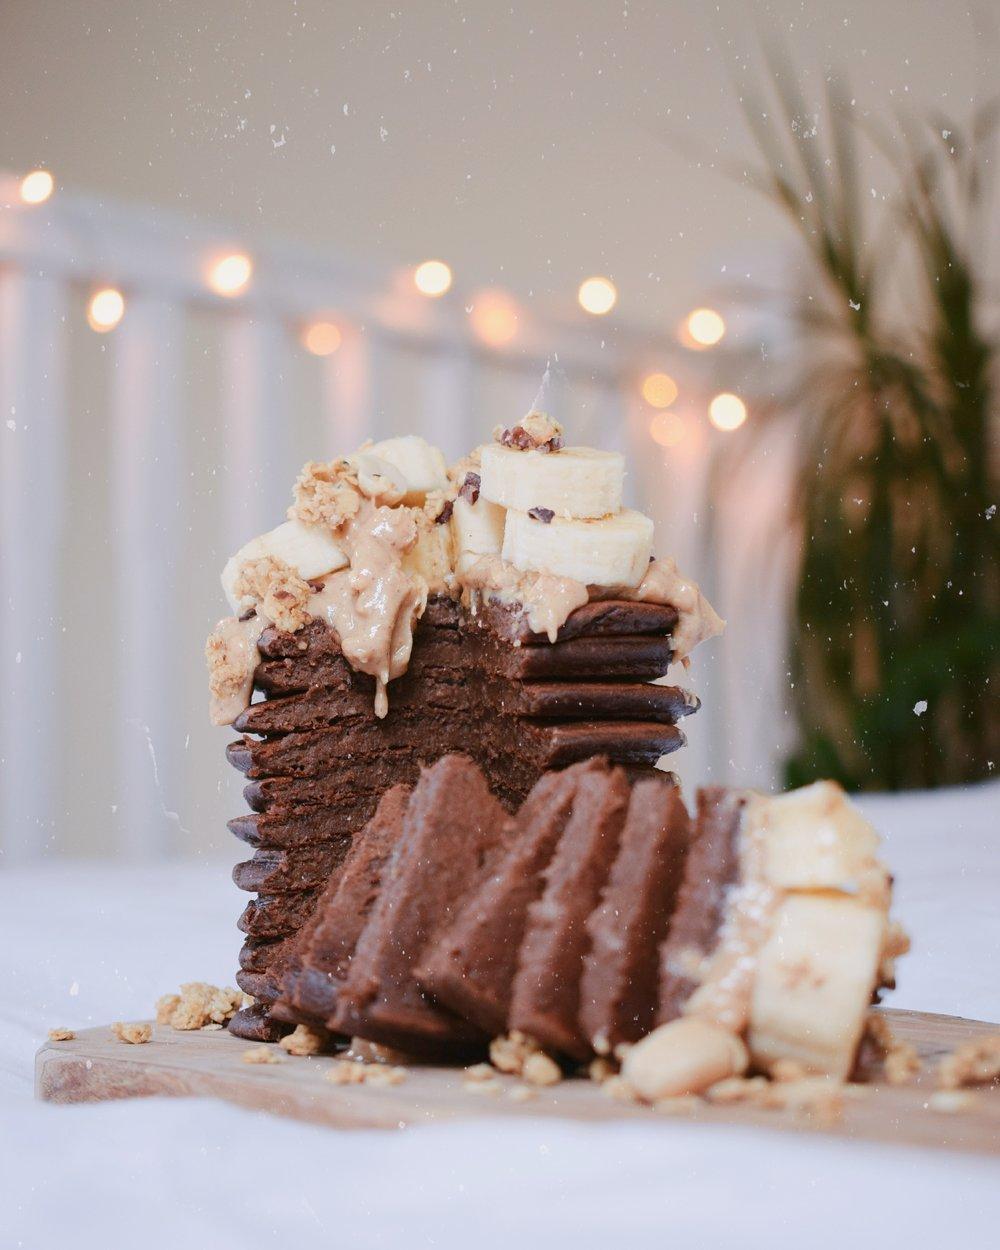 Chocolate & Peanut Butter Pancake Stack